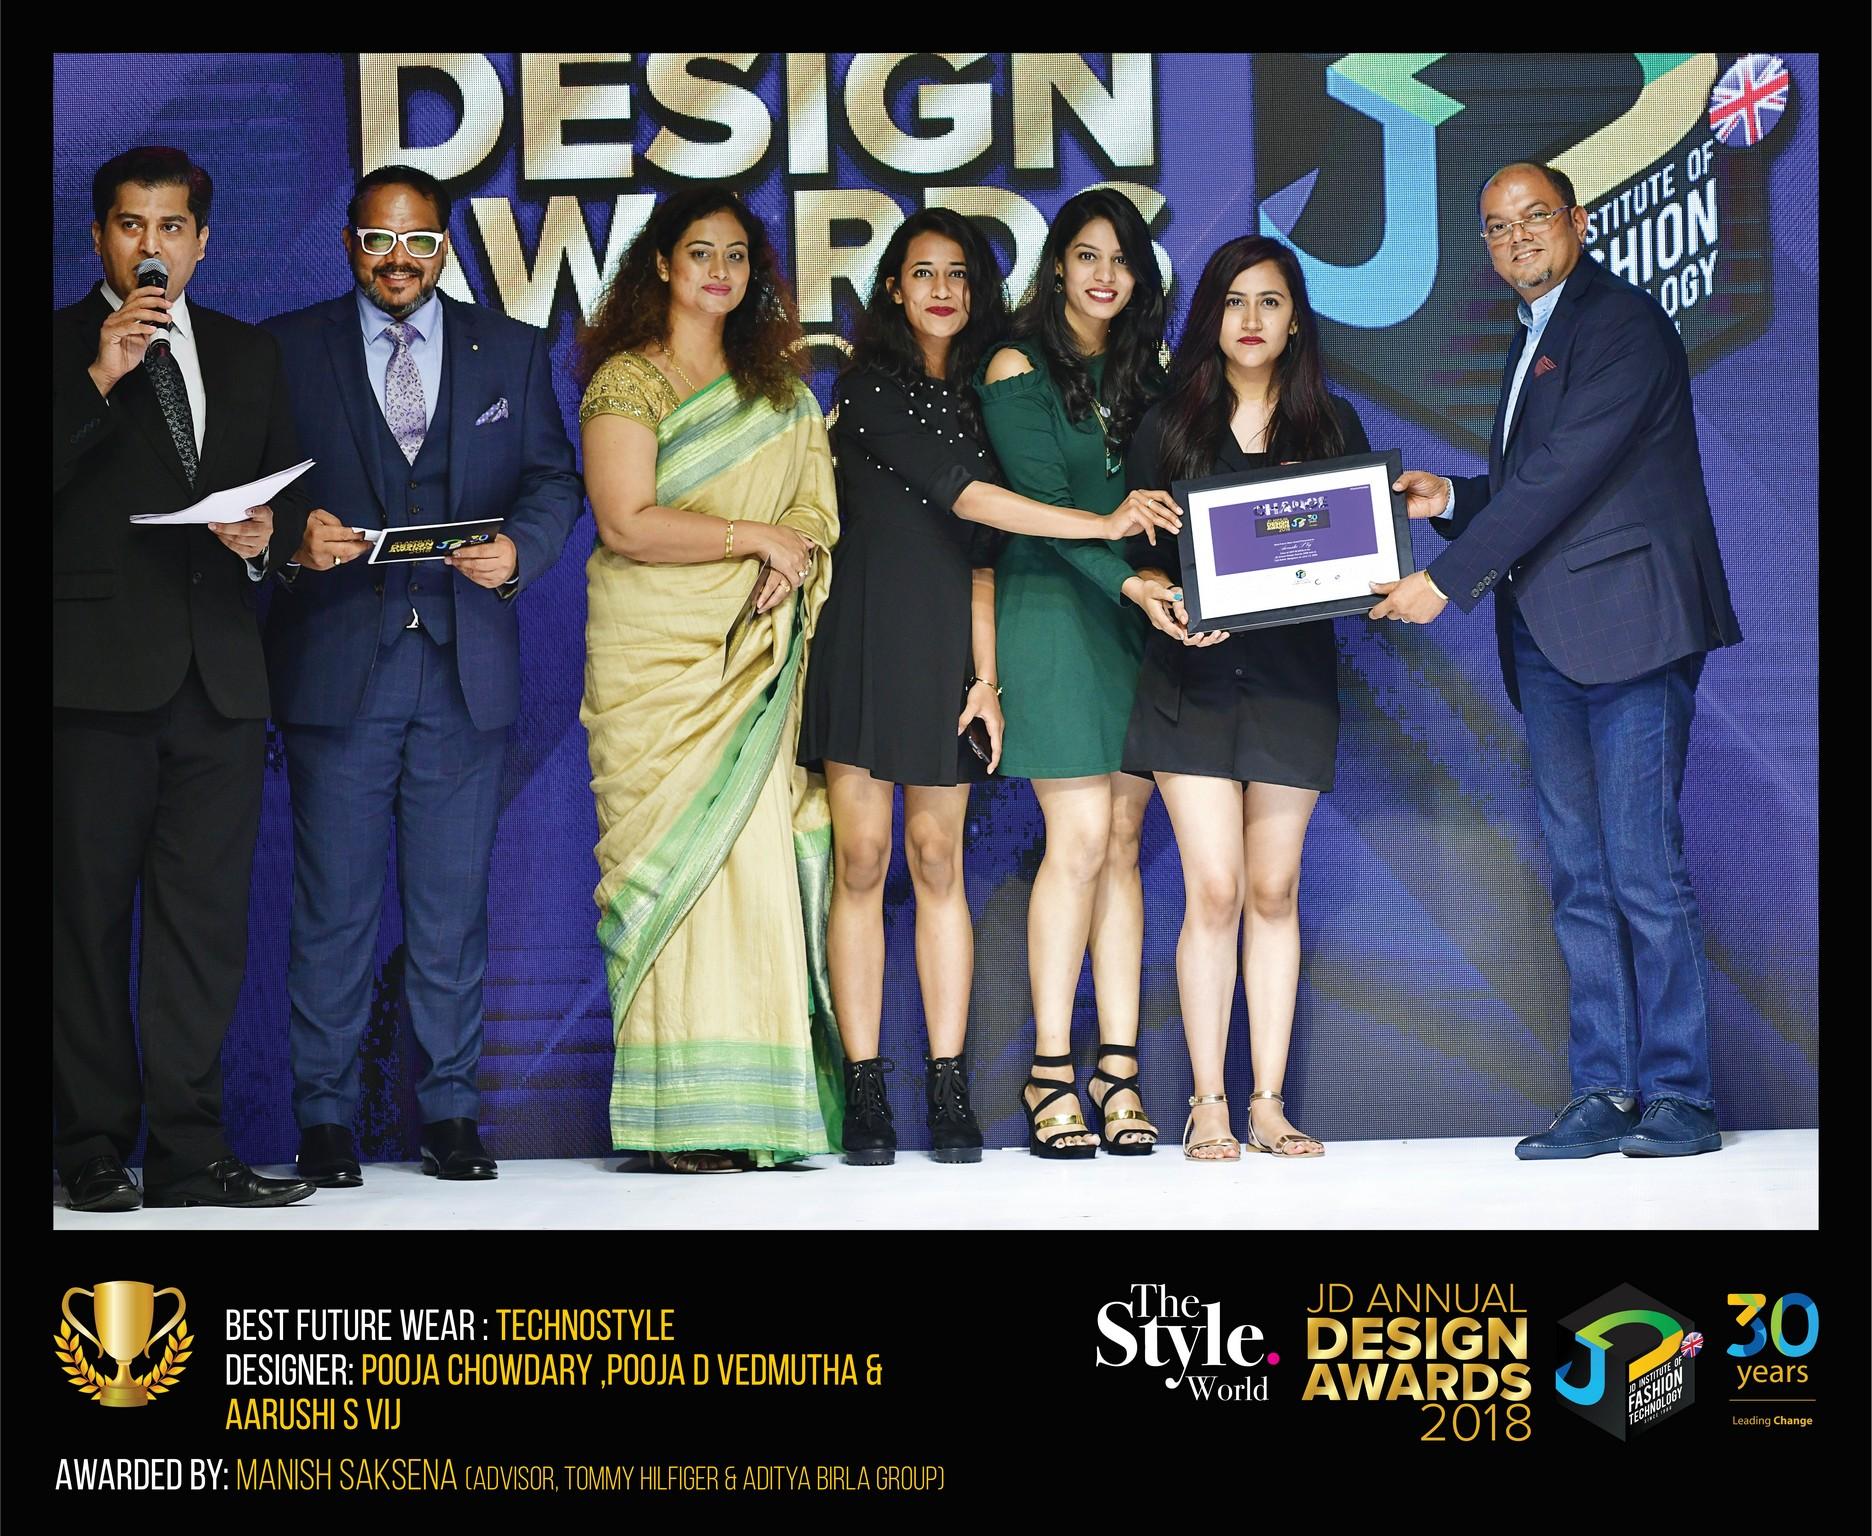 Techno style – Change – JD Annual Design Awards 2018 | Designer: M. Pooja, Pooja.D | Photography : Jerin Nath (@jerin_nath) techno style Techno style – Change – JD Annual Design Awards 2018 Technostyle8 final